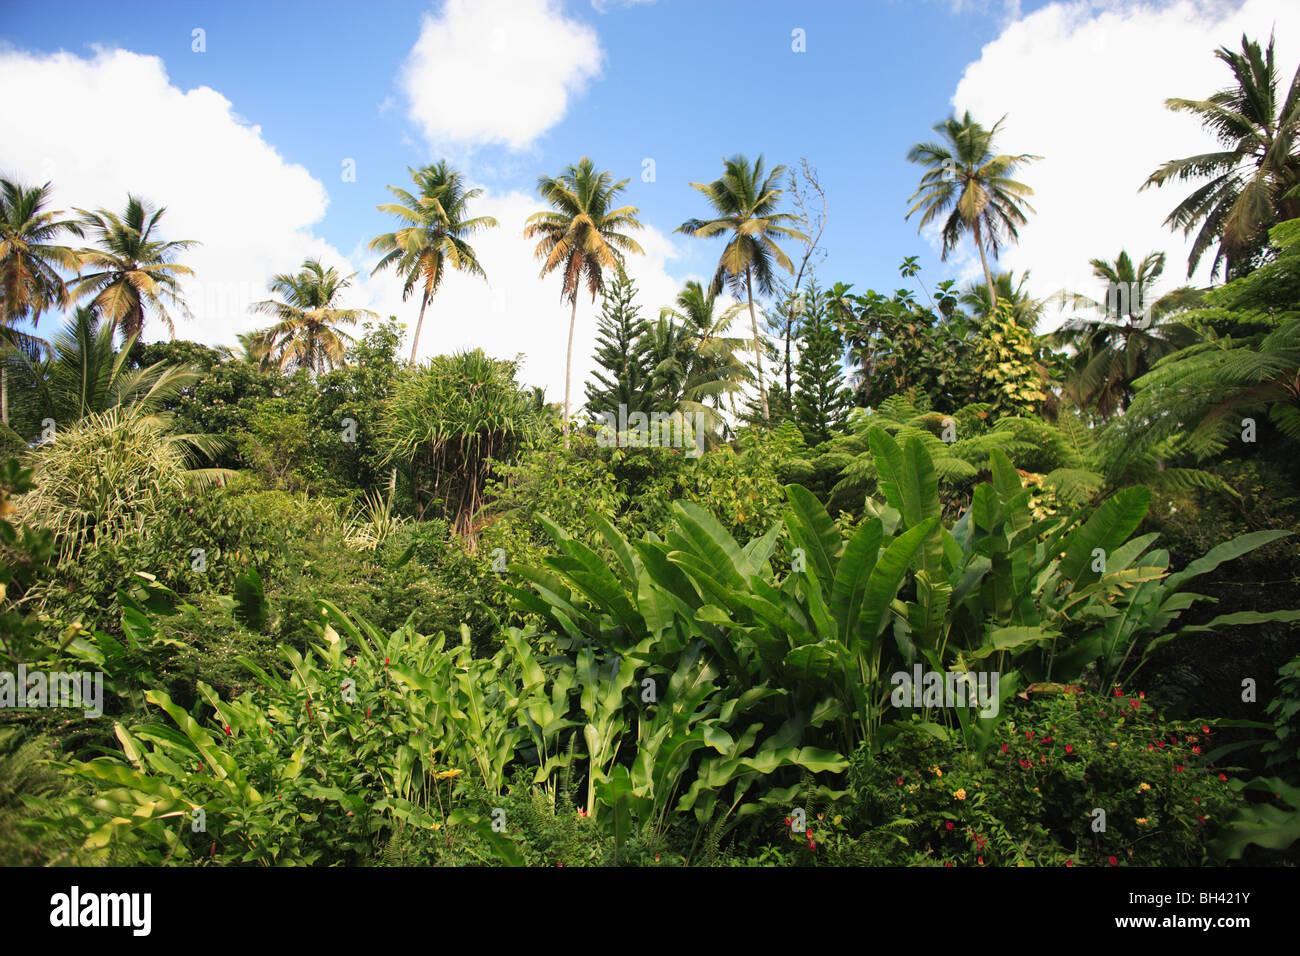 Tropical rain forest, Dominica, Caribbean - Stock Image